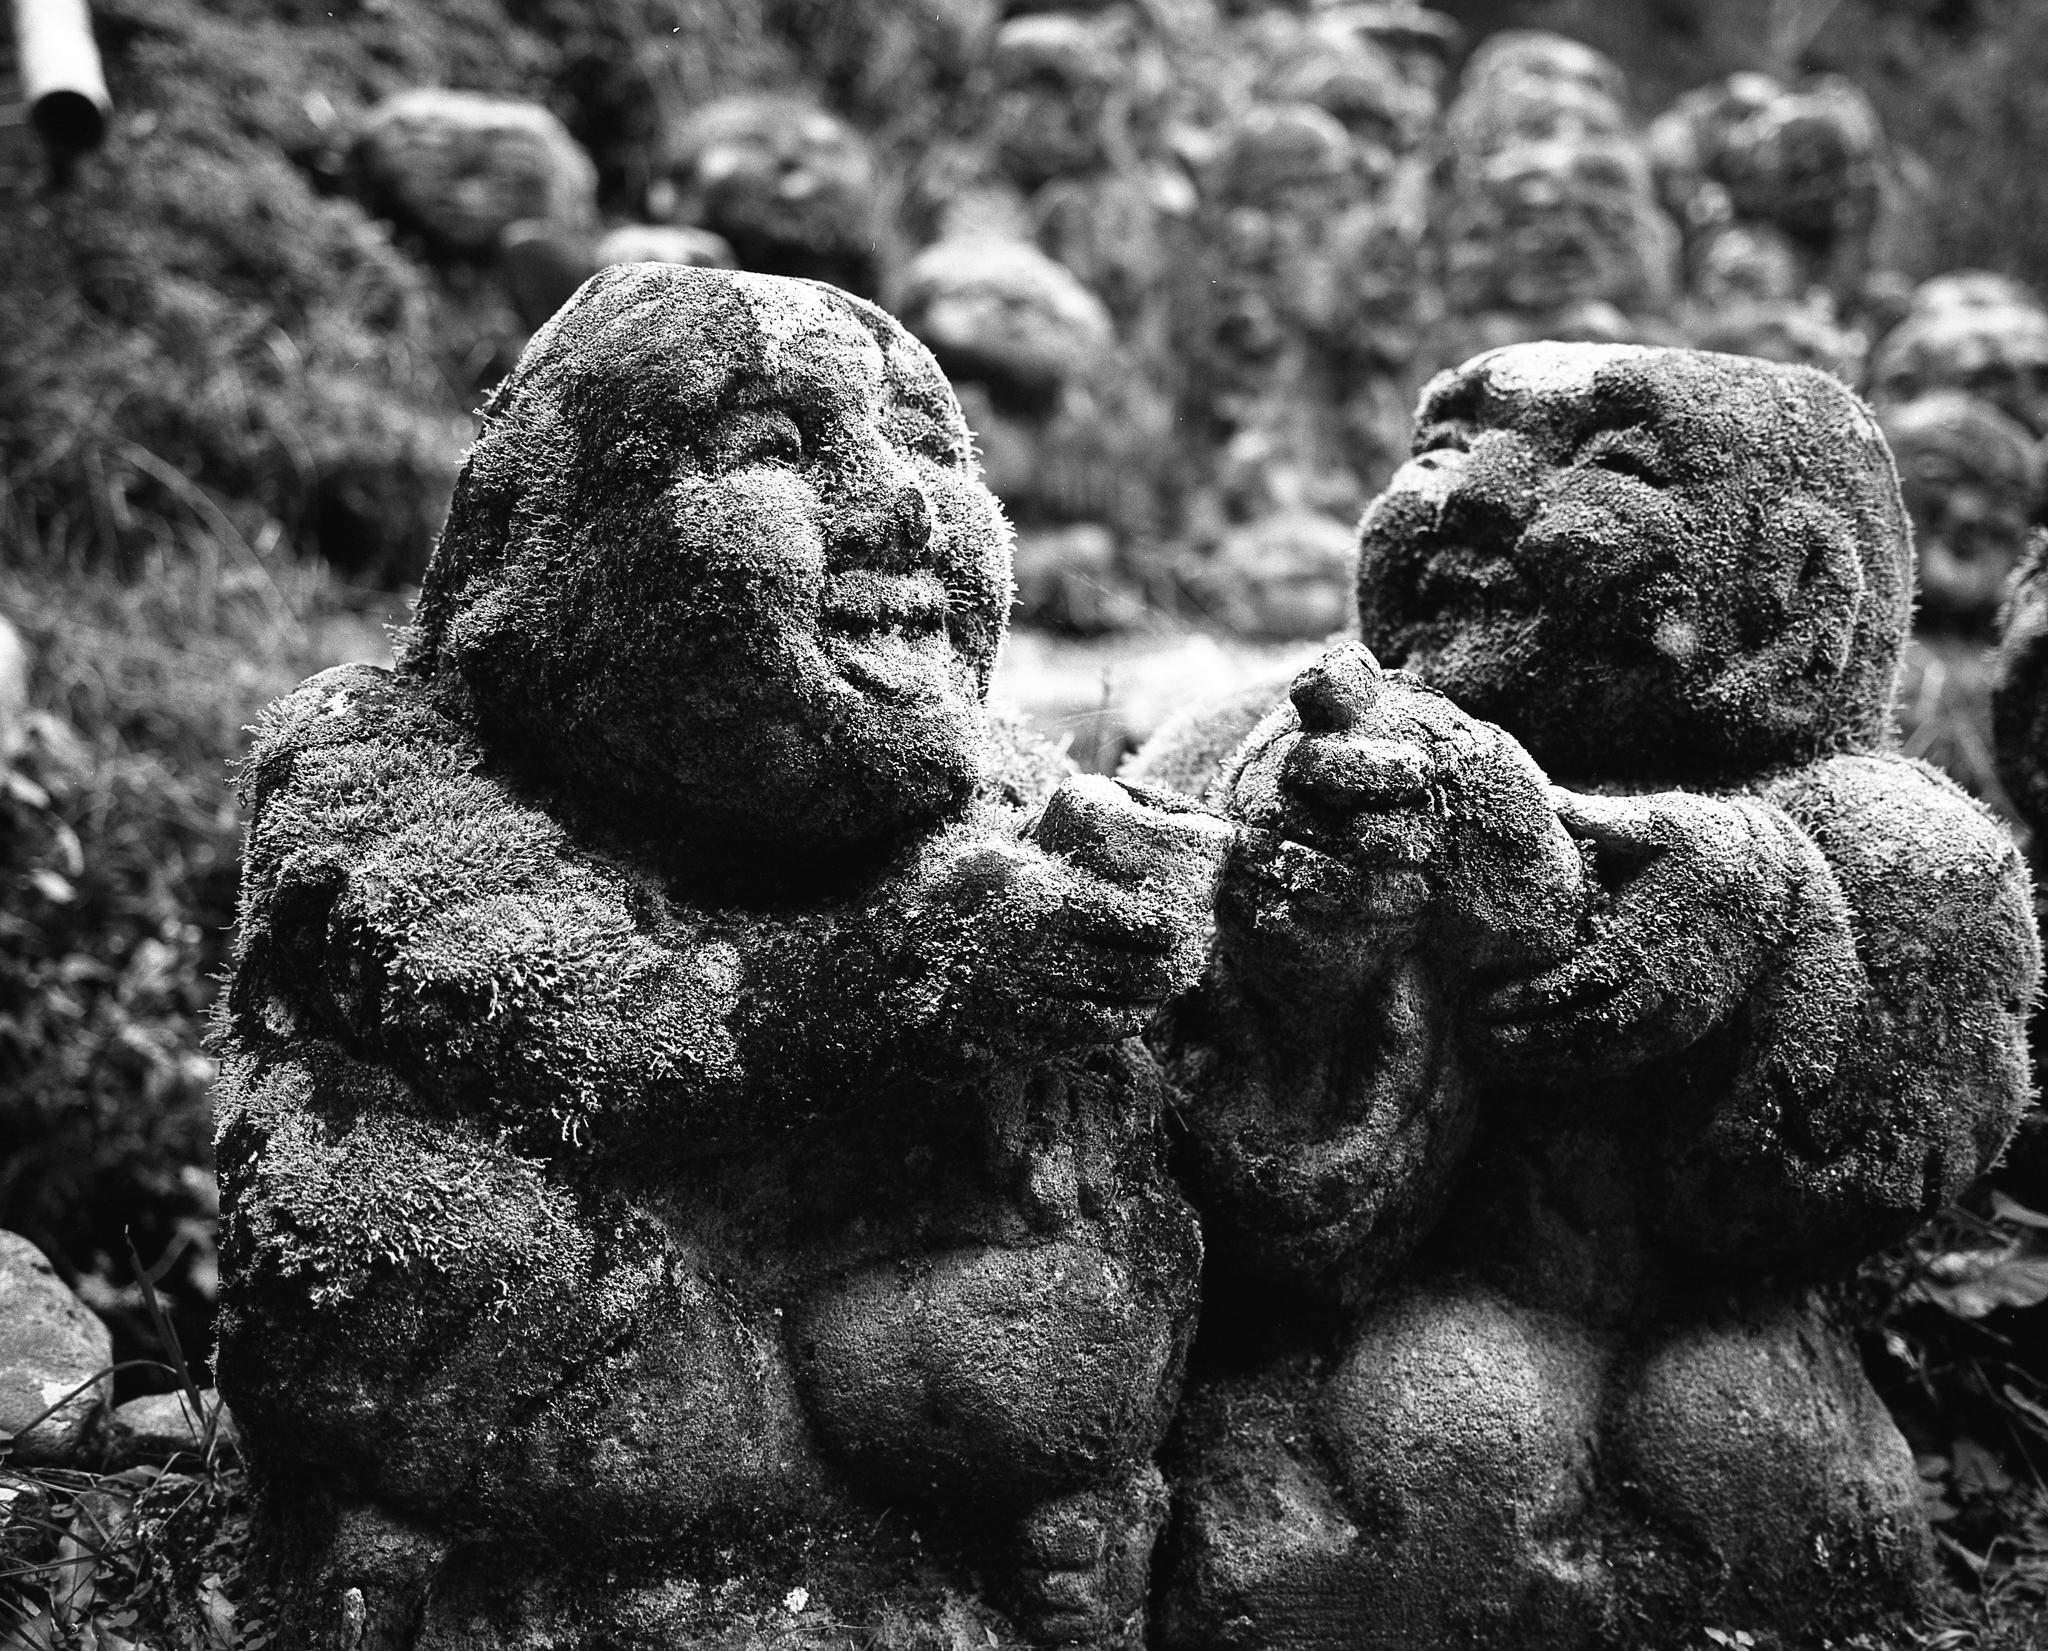 Statues at Otagi Nenbutsu-ji in Kyoto - old friends, frozen in time (Mamiya 7ii Ilford HP5+)